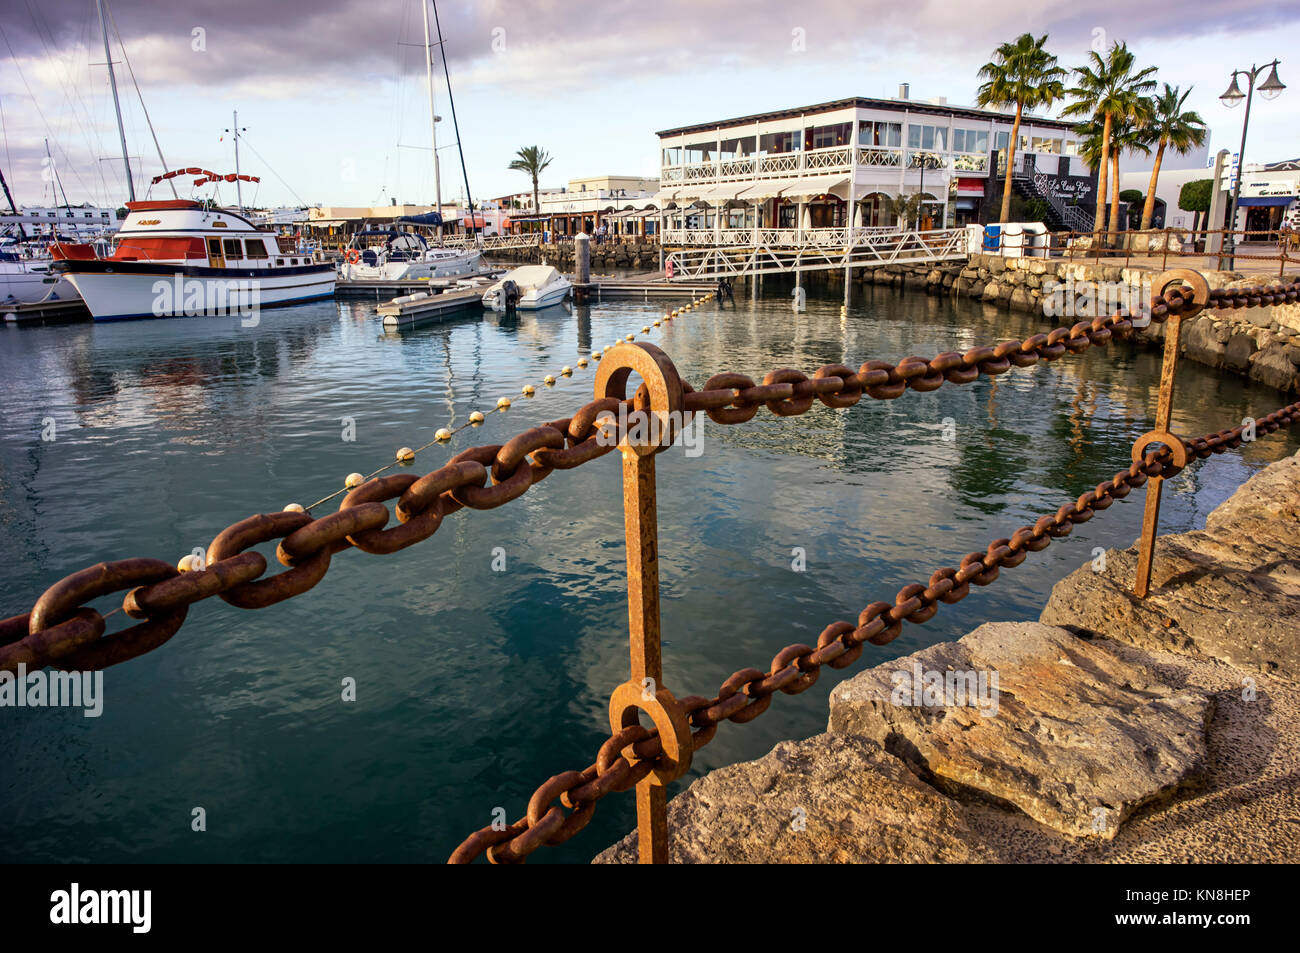 Marina Rincon, Playa Blanca, Lanzarote, Canary Islands, Spain - Stock Image